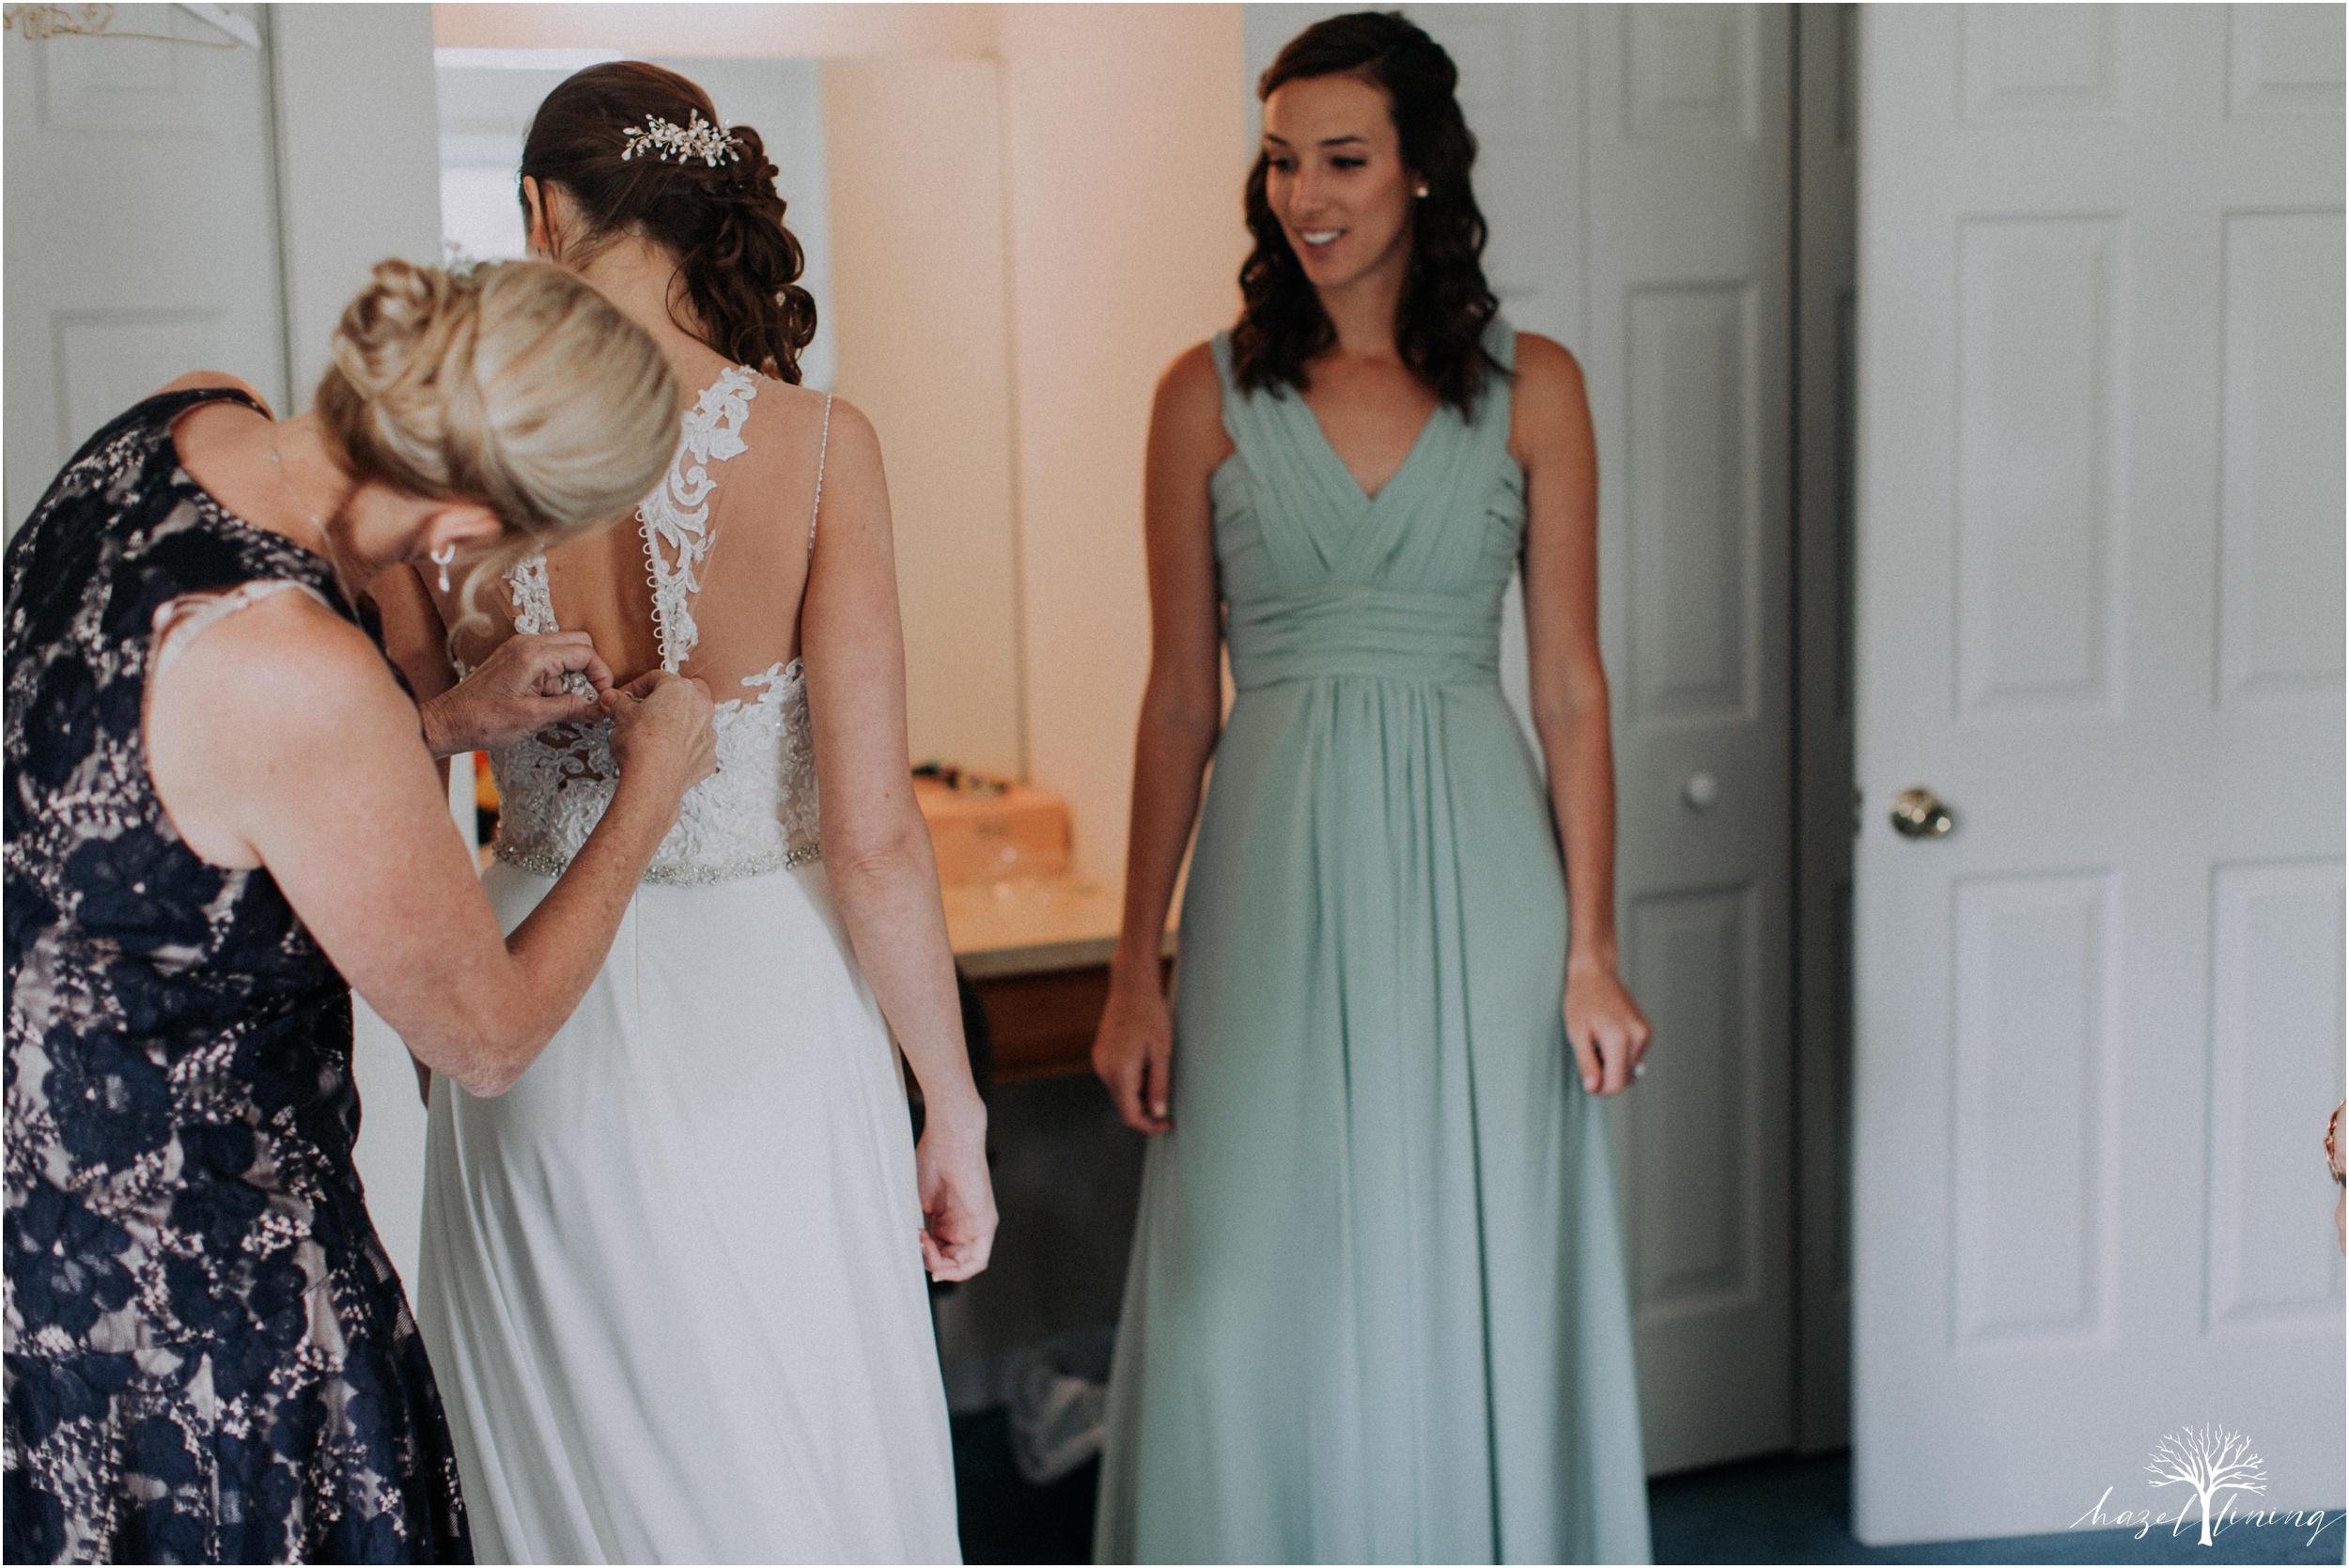 hazel-lining-travel-wedding-elopement-photography_0017.jpg